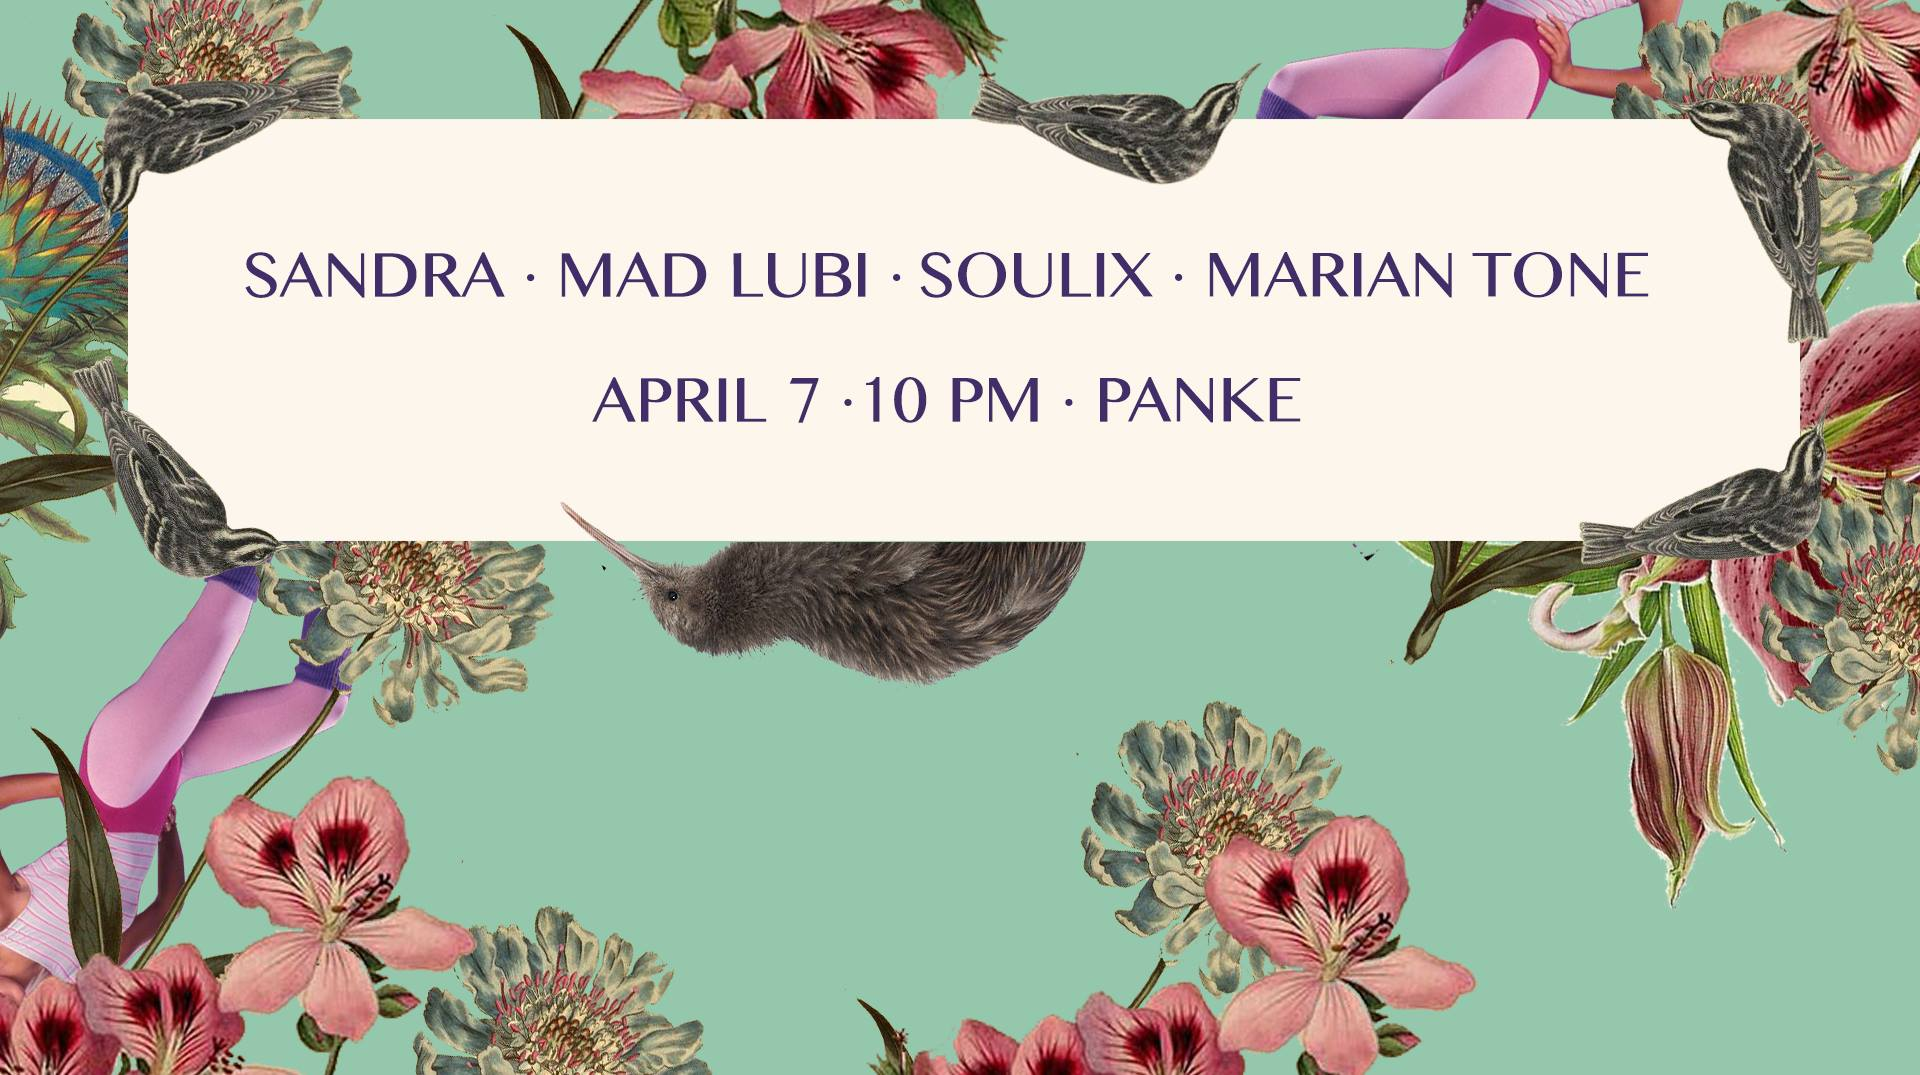 MT's Bar Night with Sandra, Mad Lubi, Soulix & Marian Tone